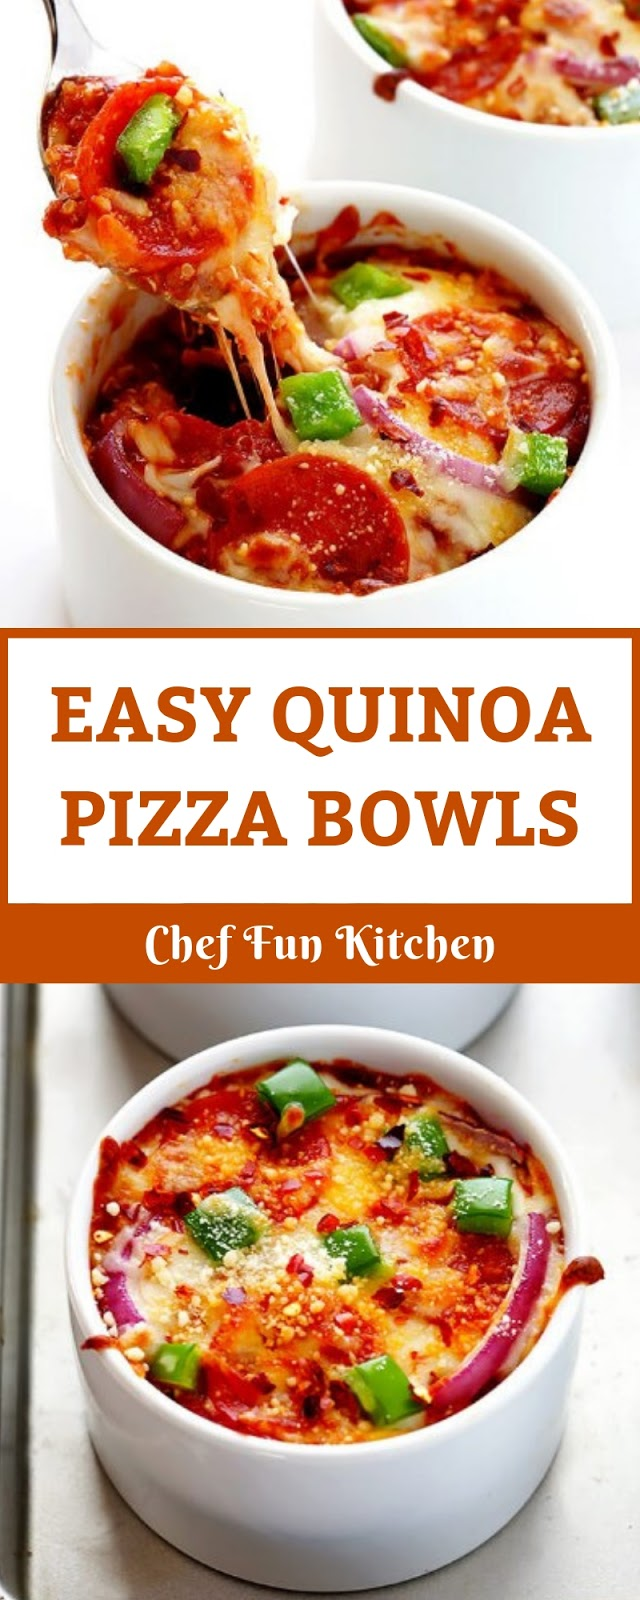 EASY QUINOA PIZZA BOWLS